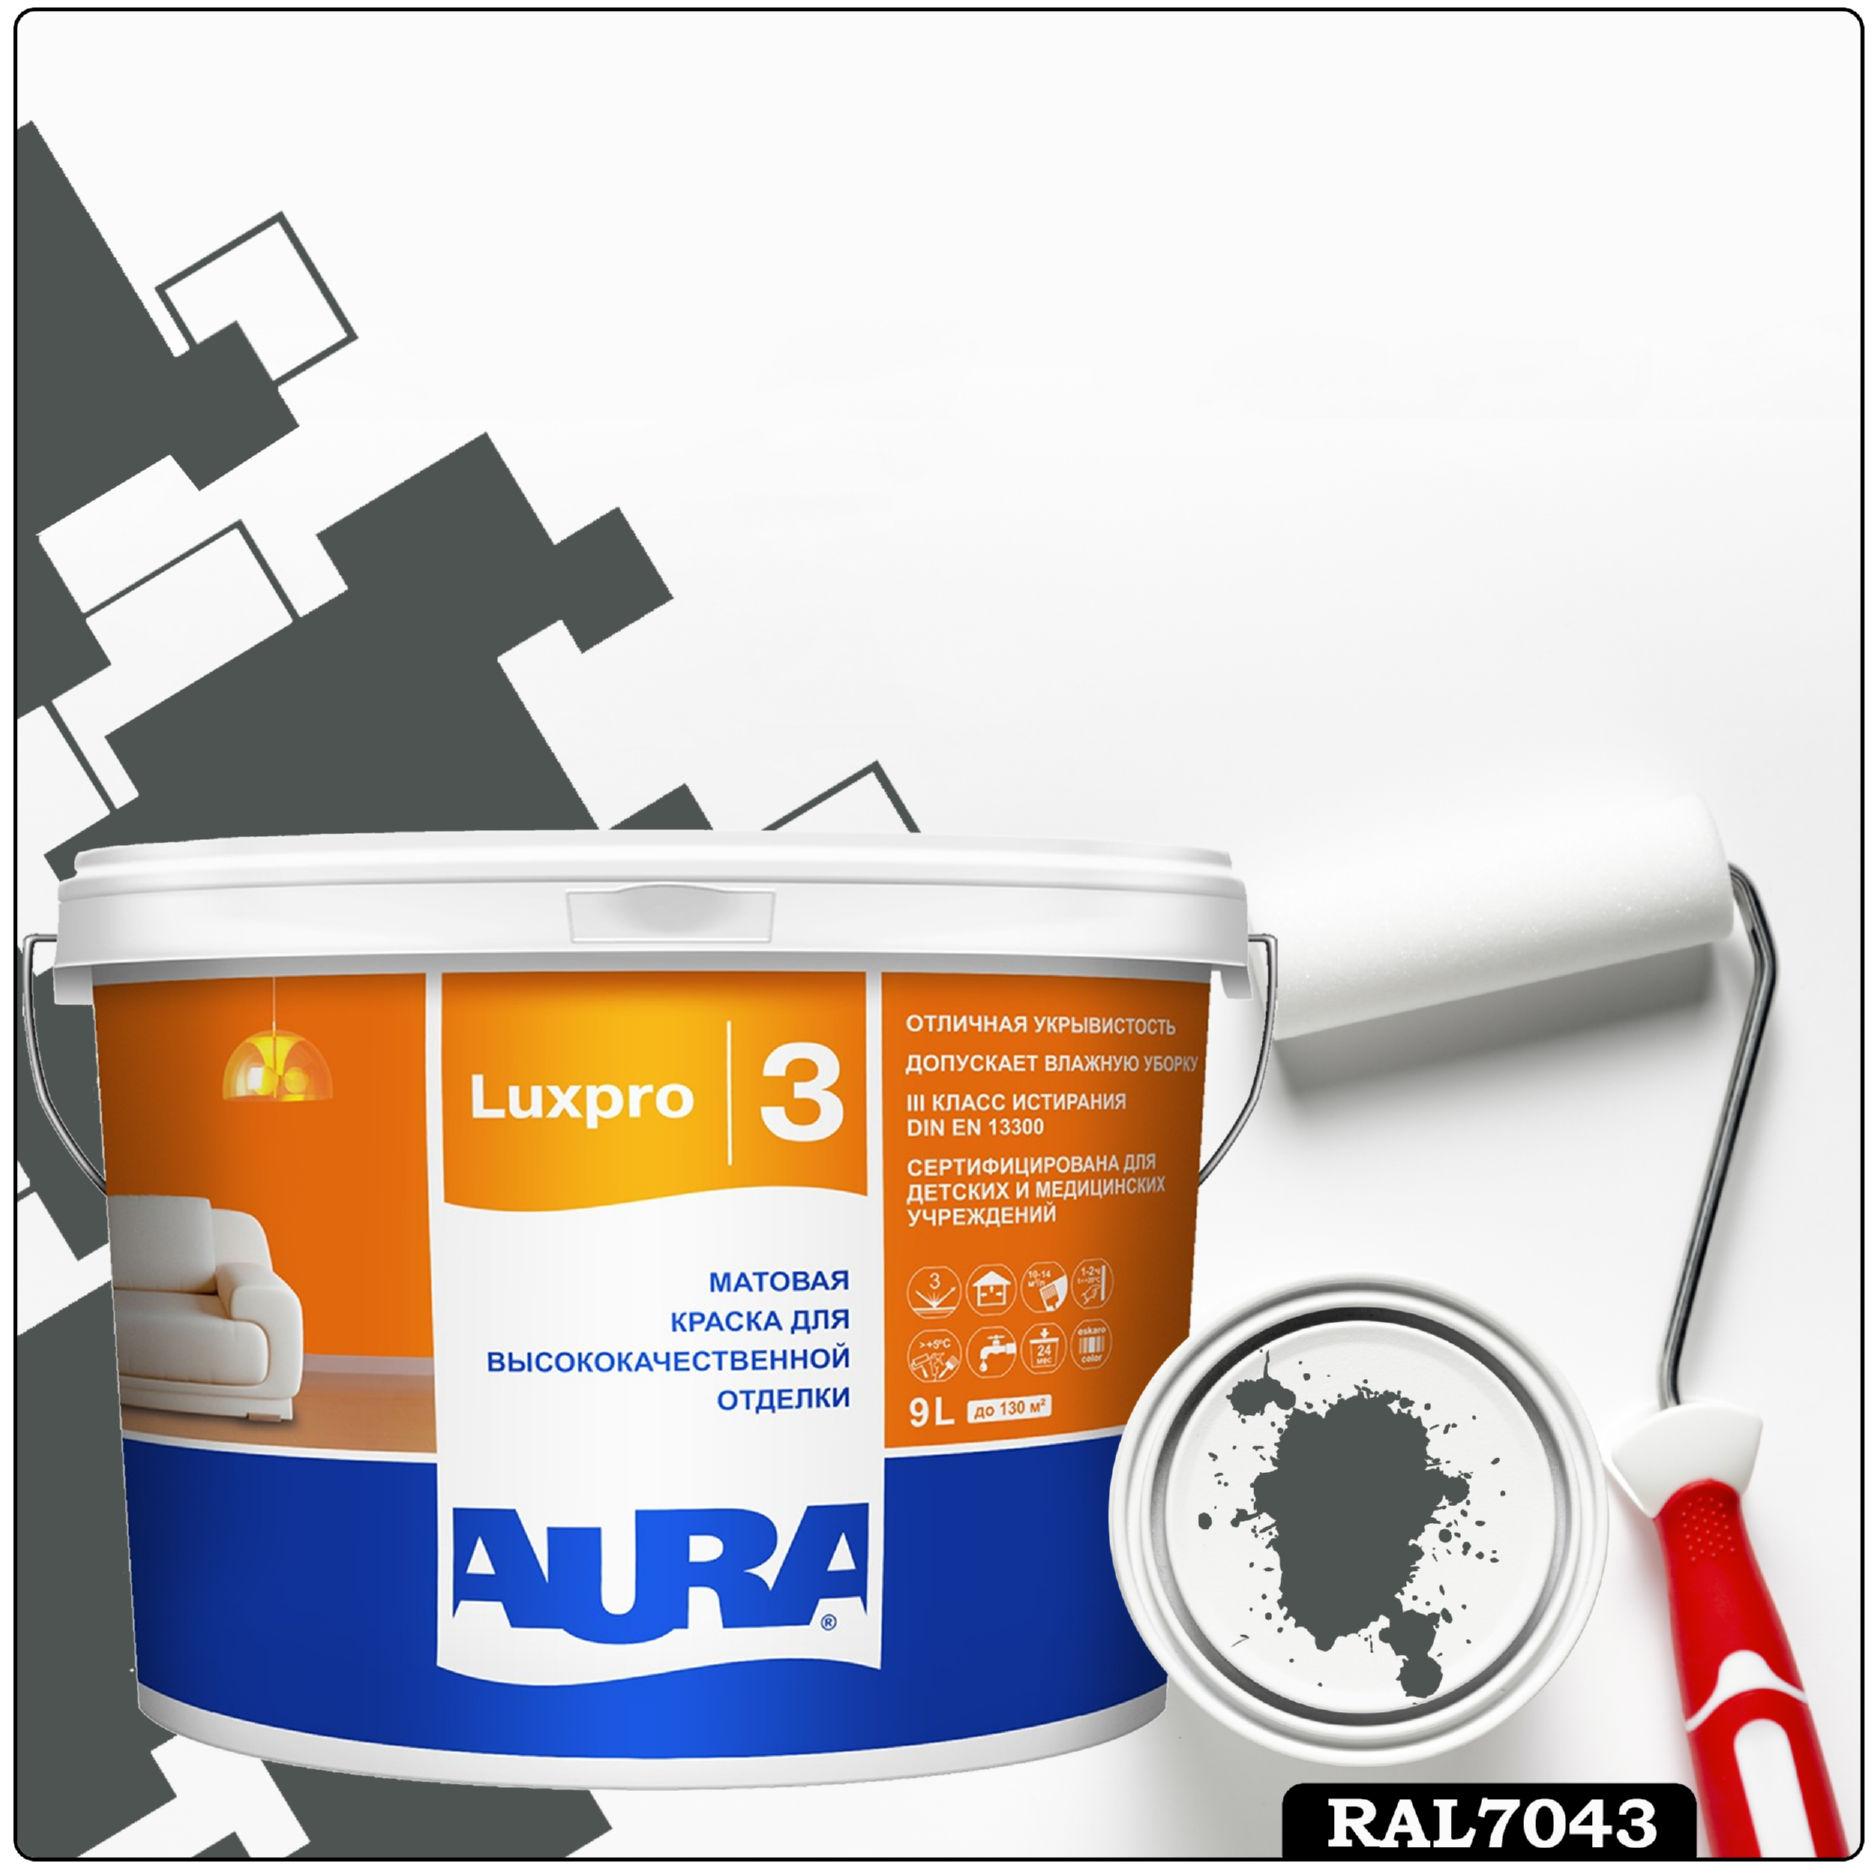 Фото 2 - Краска Aura LuxPRO 3, RAL 7043 Транспортный серый В, латексная, шелково-матовая, интерьерная, 9л, Аура.